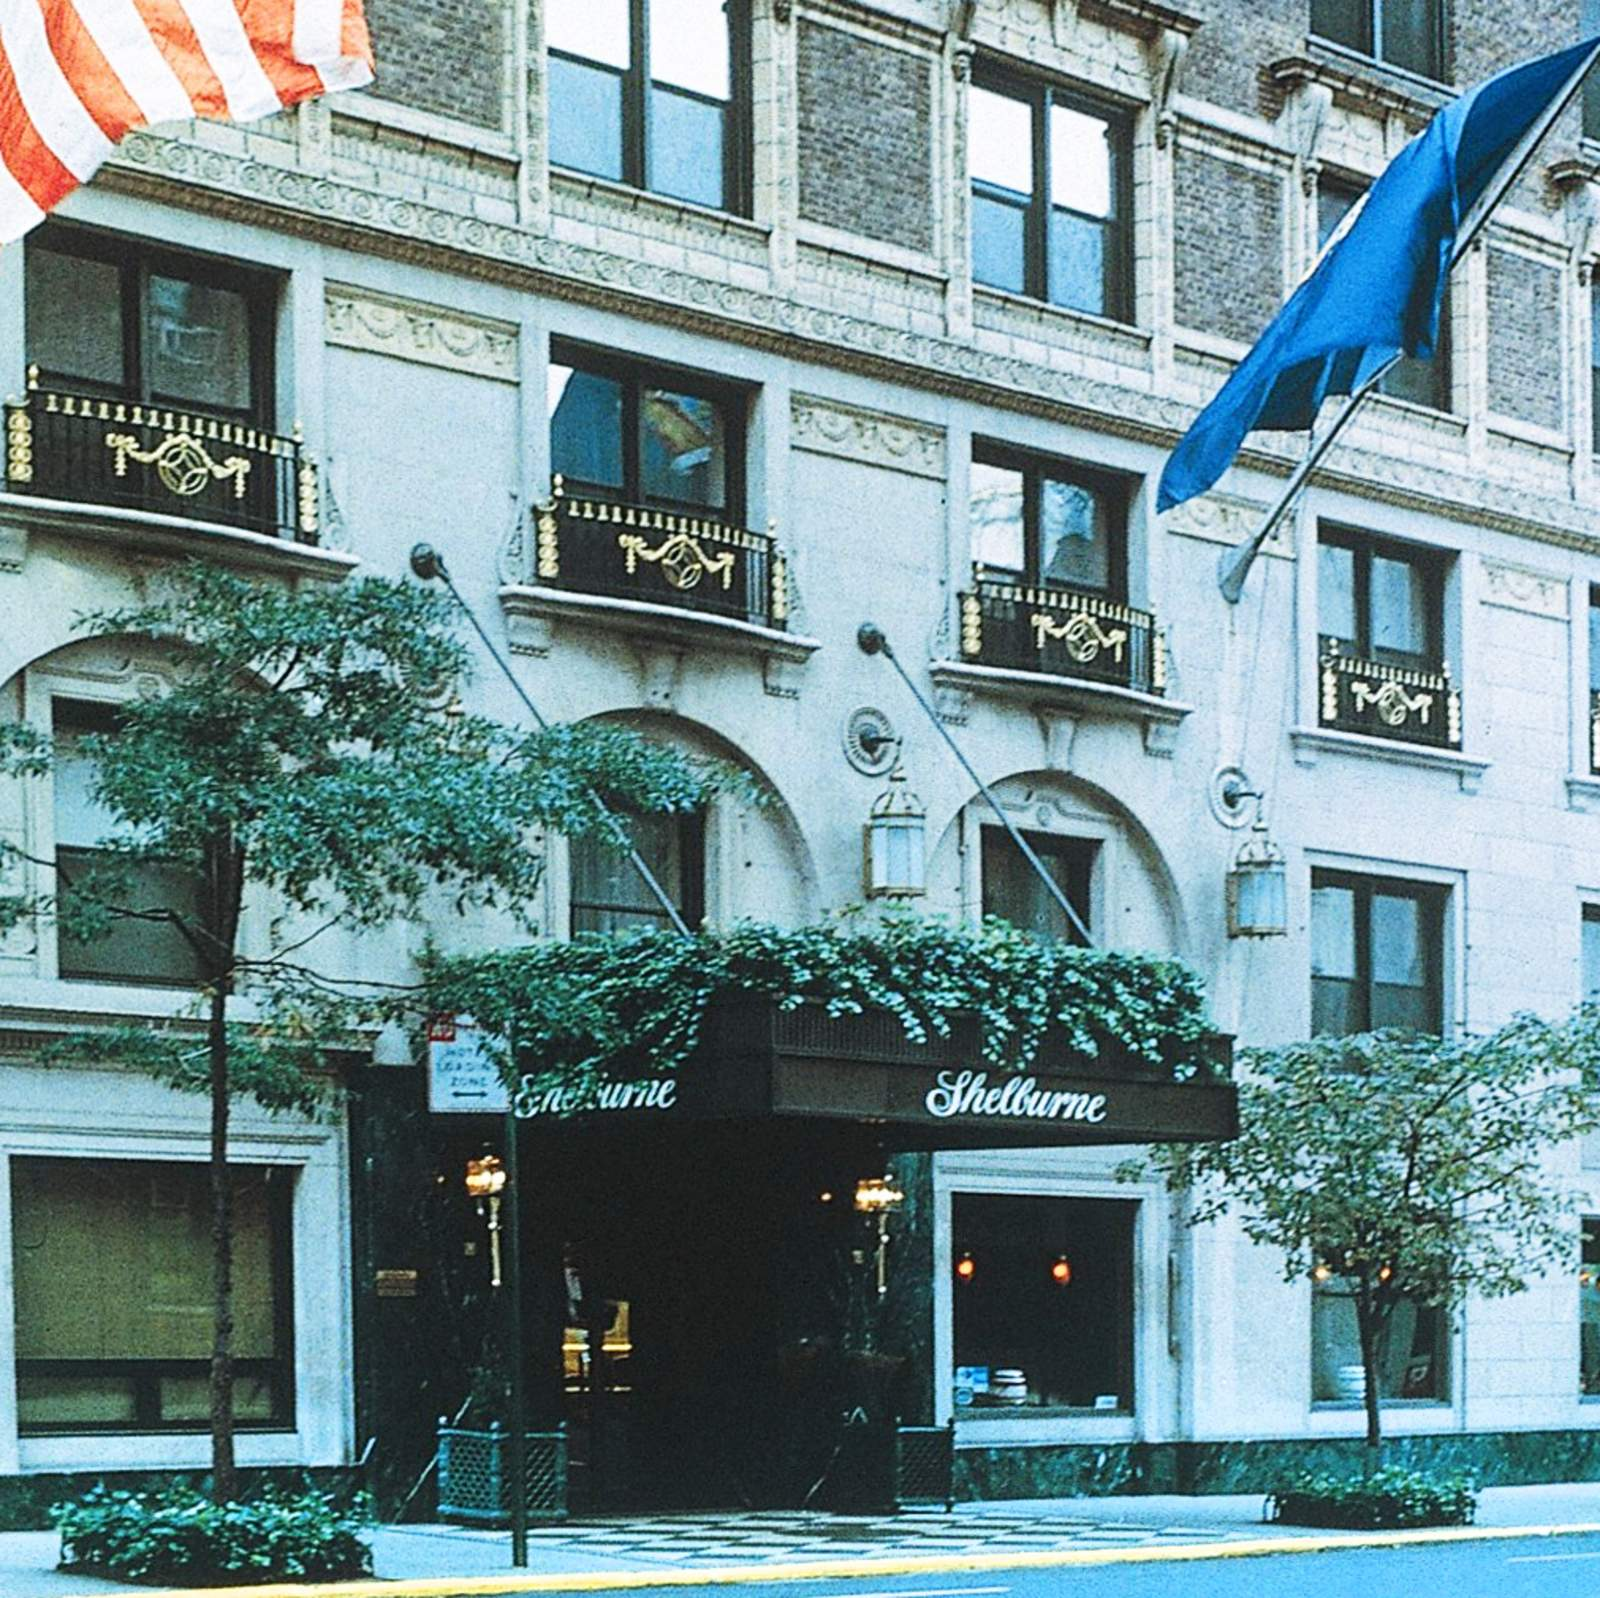 Hotel, New York: Shelburne NYC - An Affinia Hotel